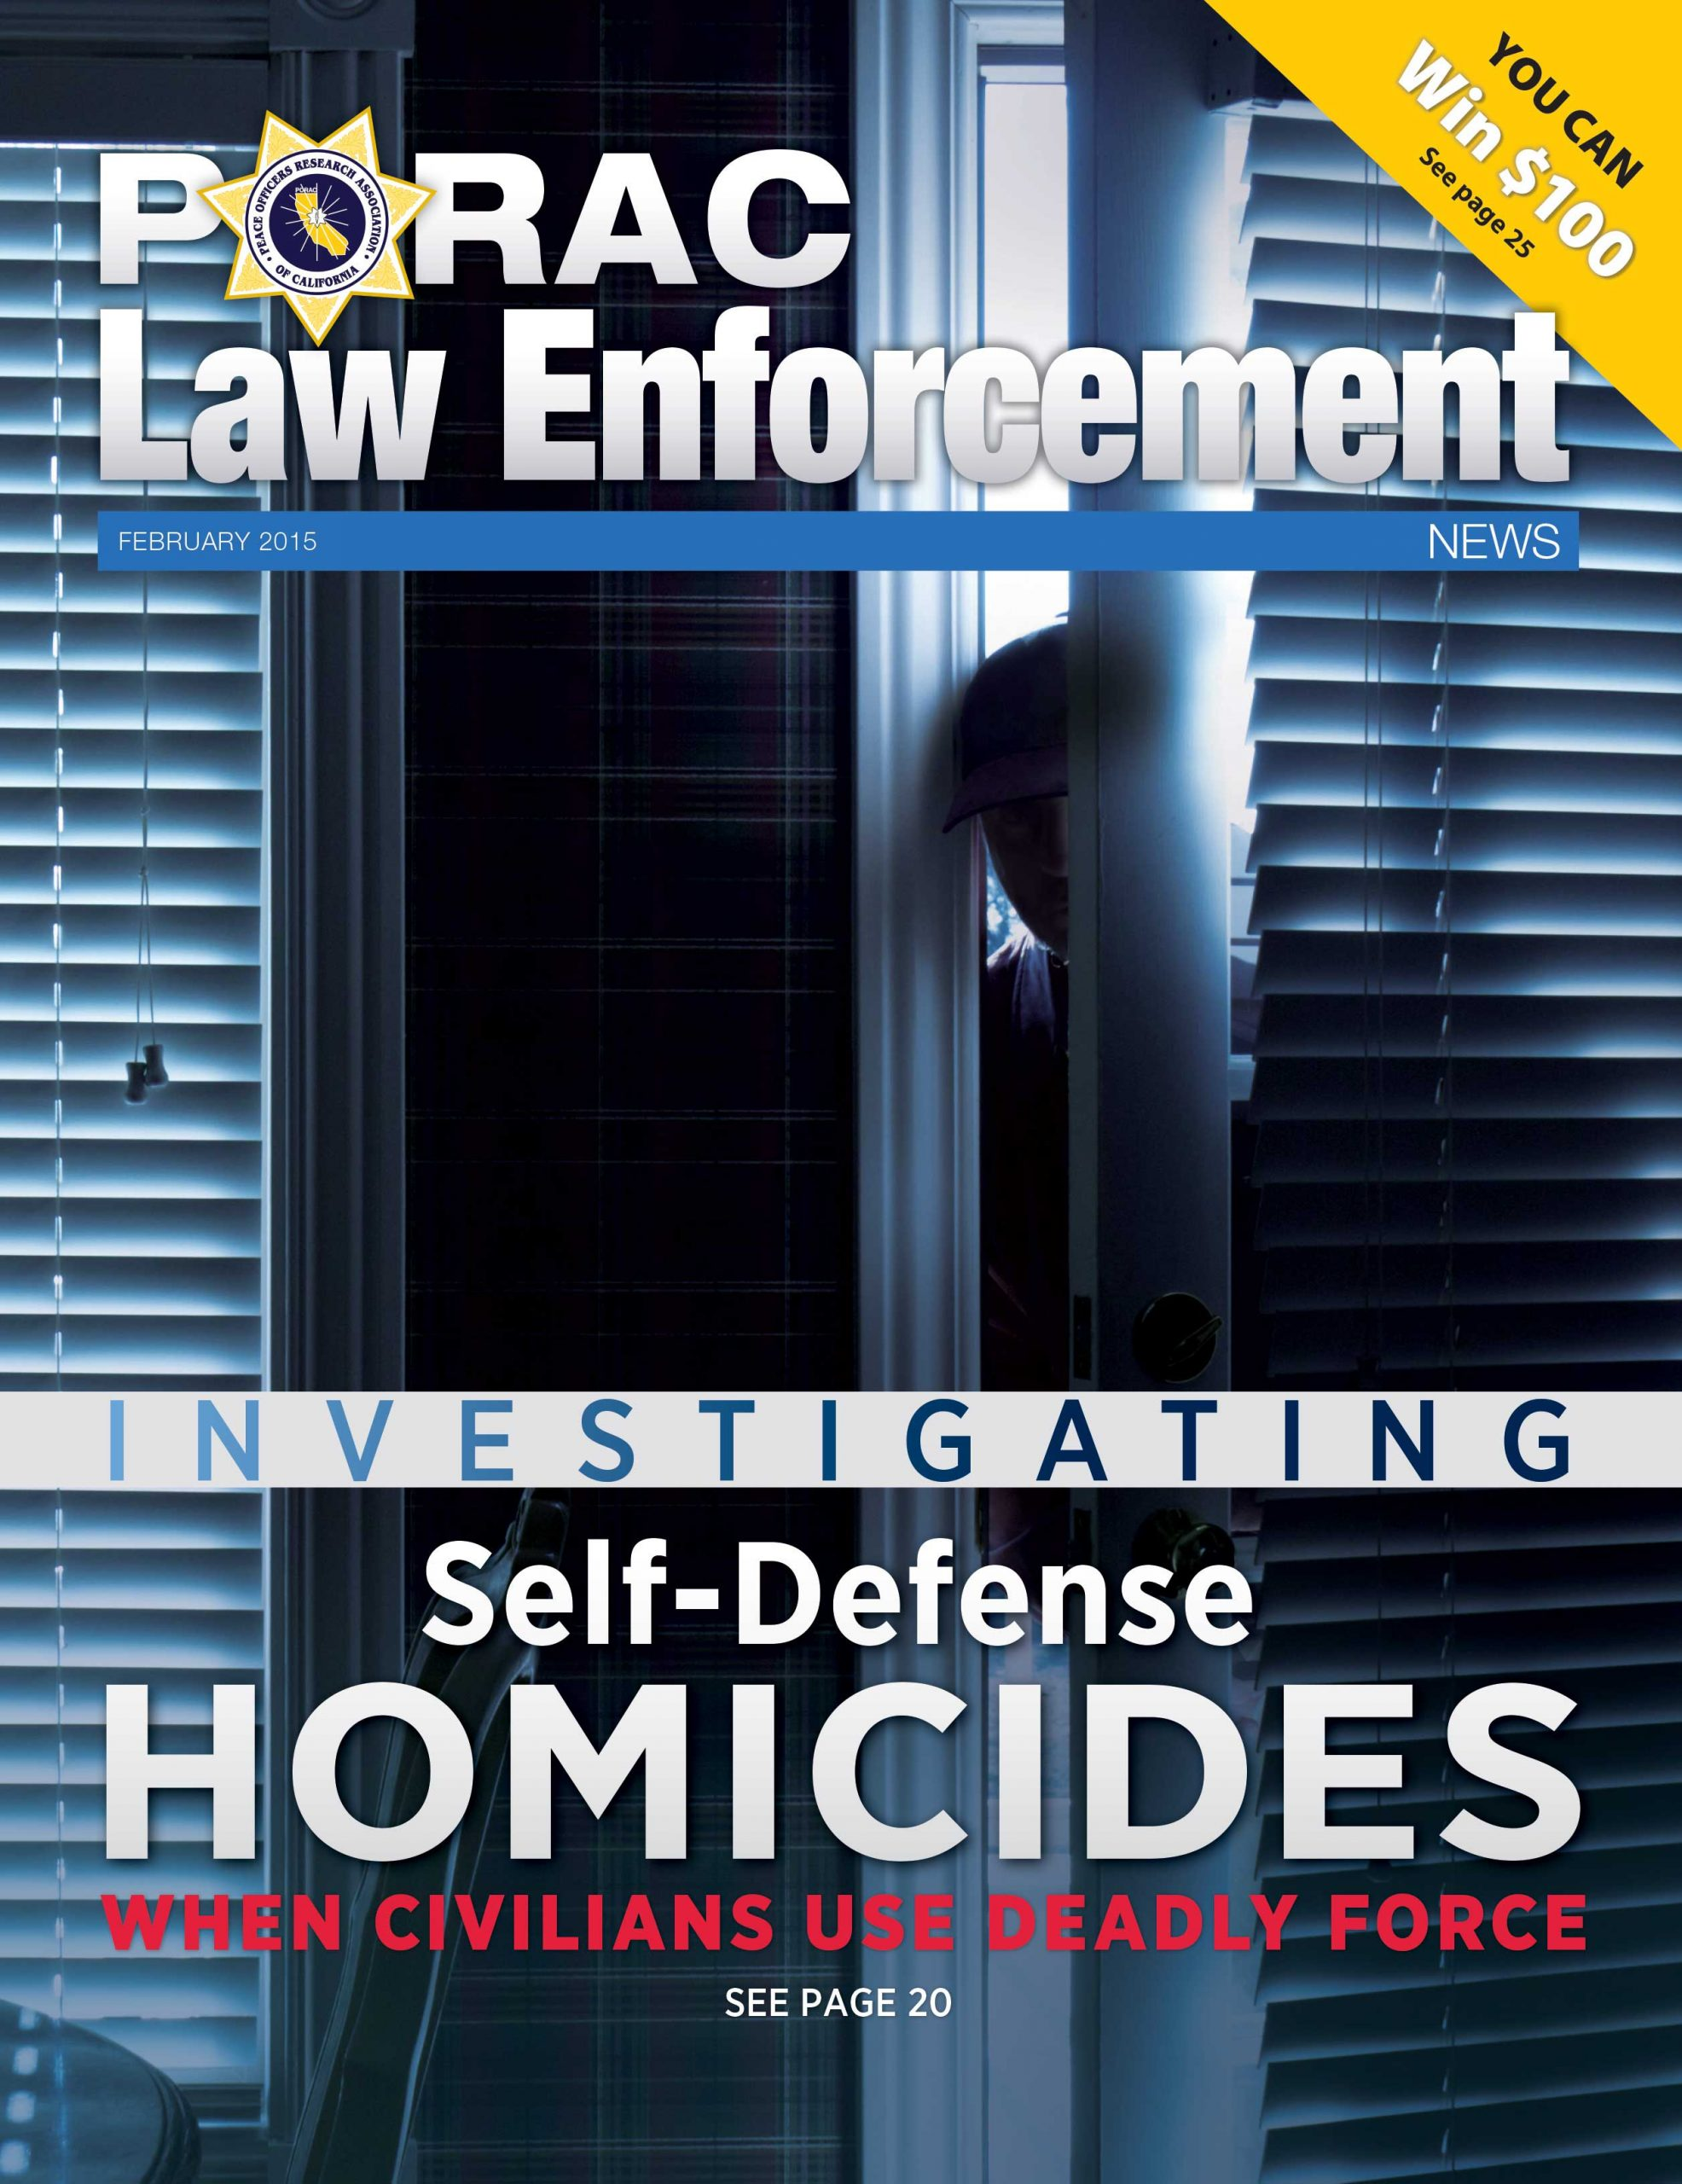 PORAC Law Enforcement News – February 2015